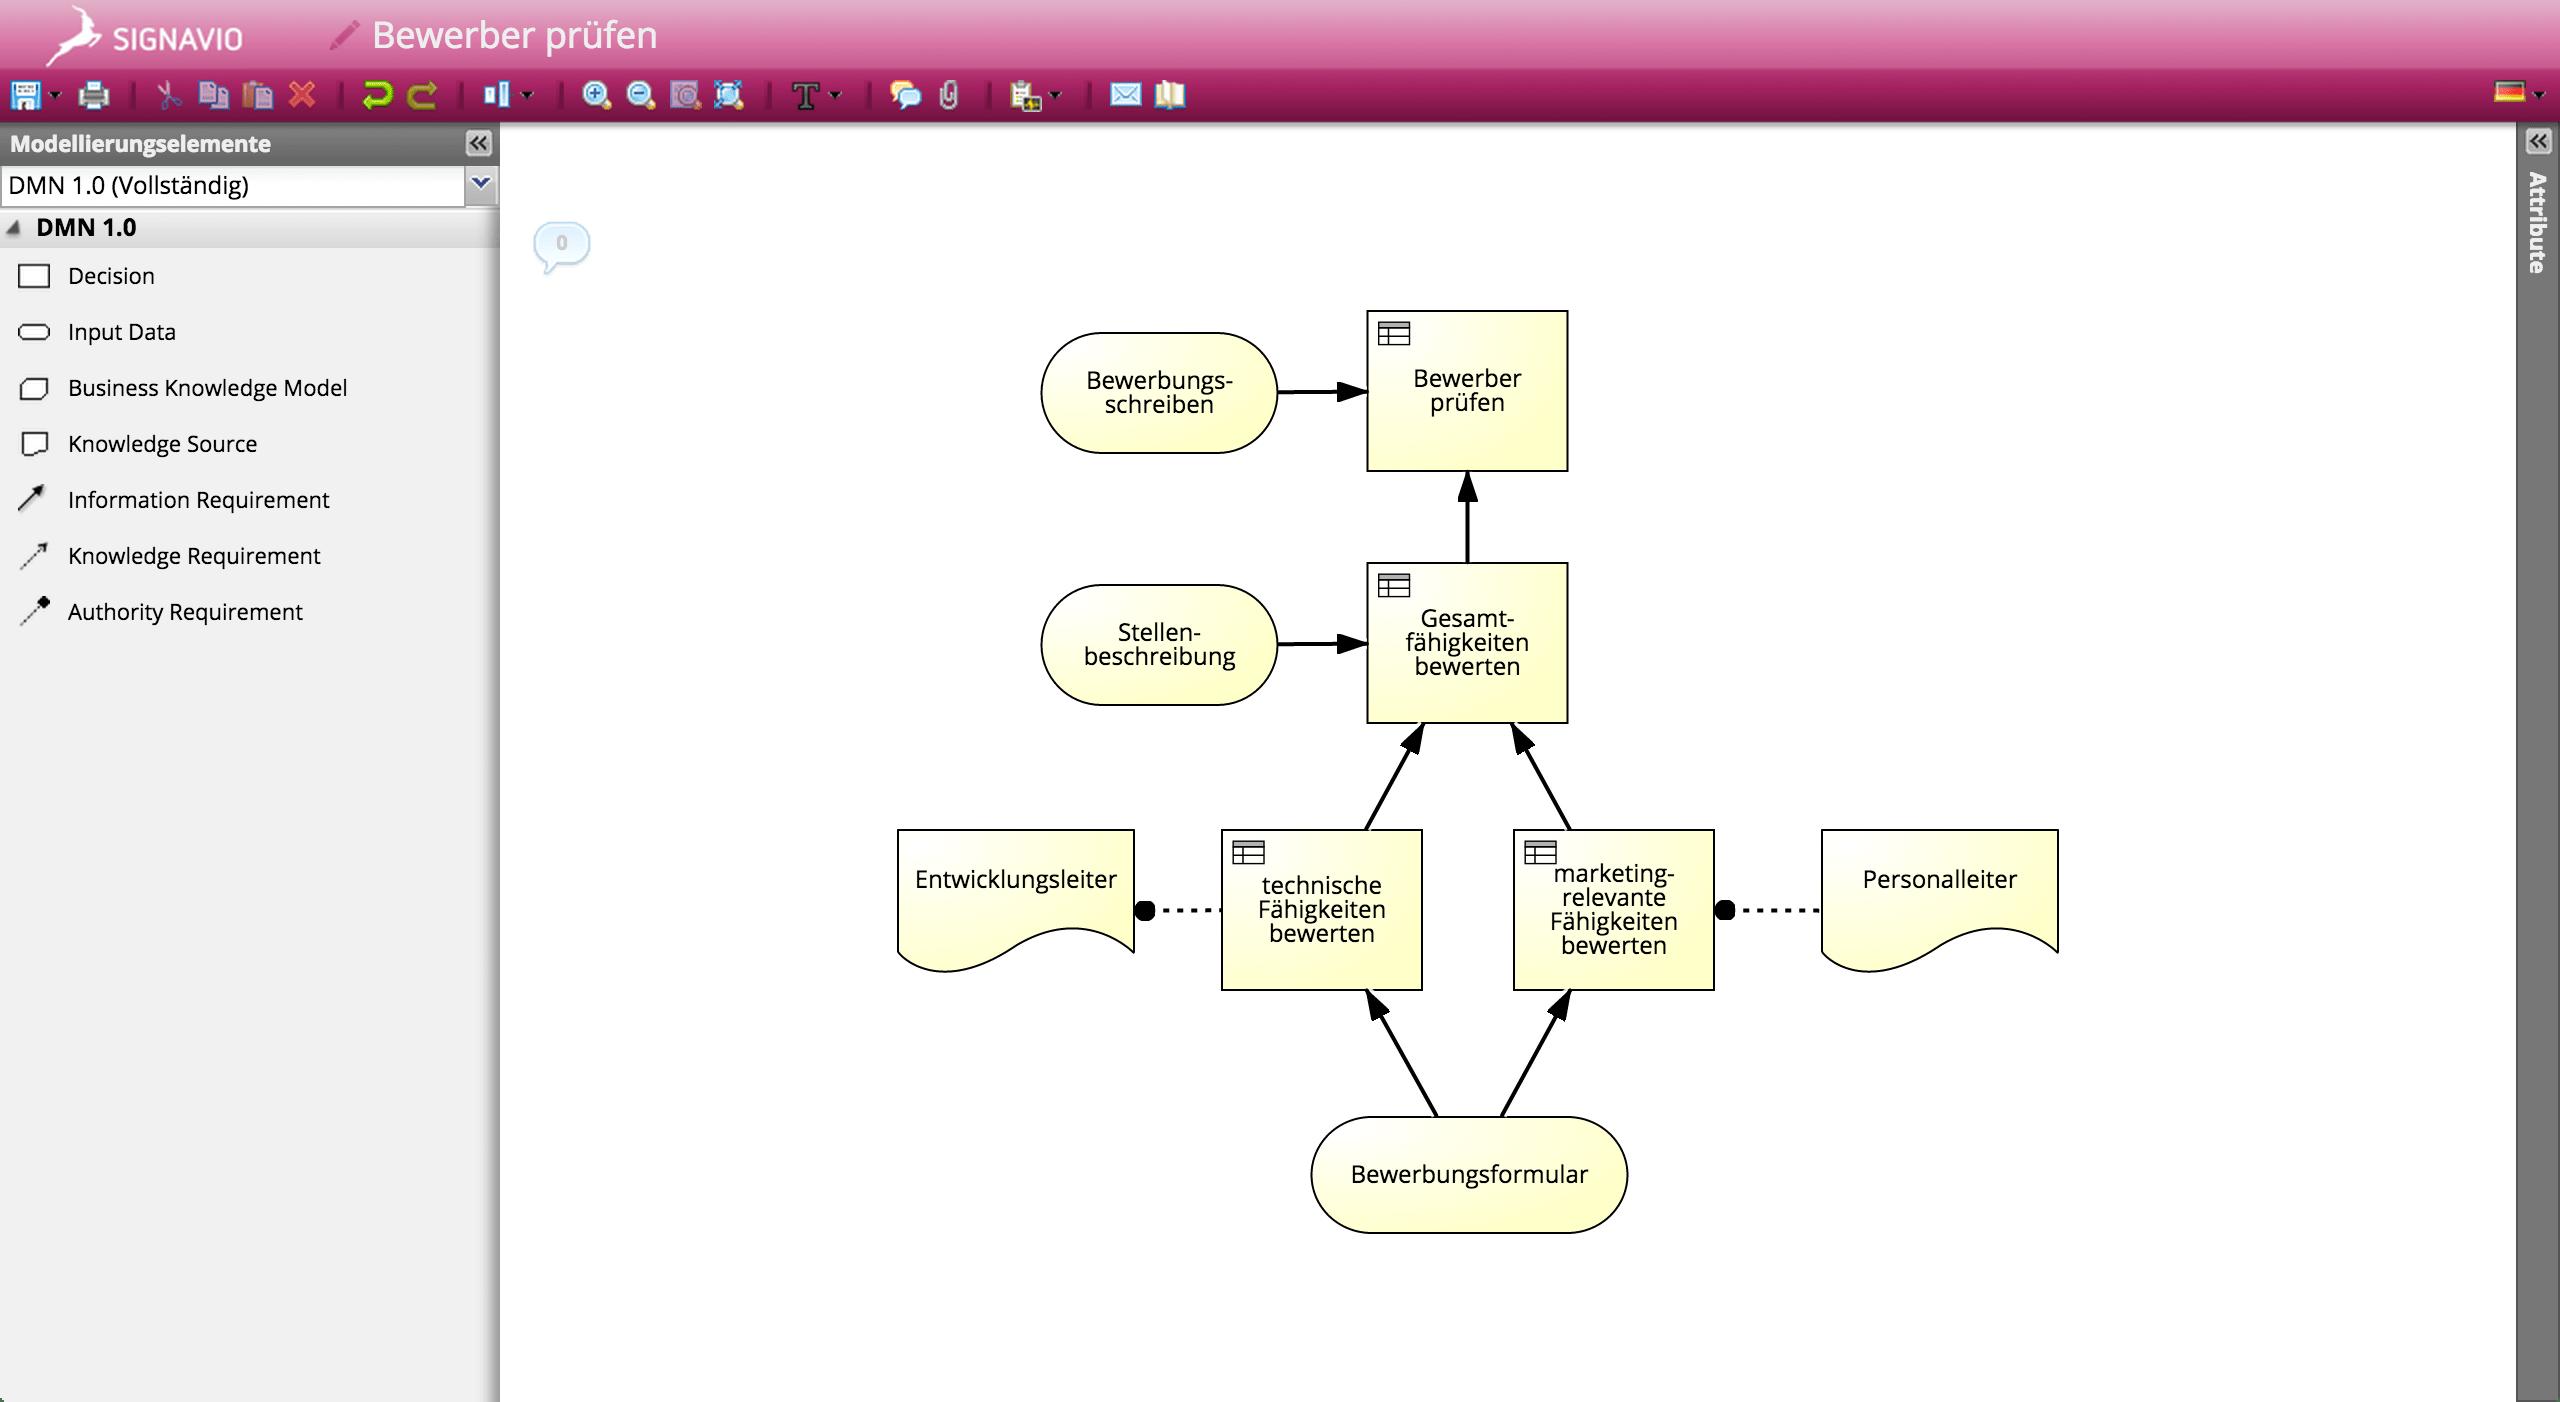 Entscheidungsdiagramm DMN 1.0 Signavio Decision Manager - Screenshot